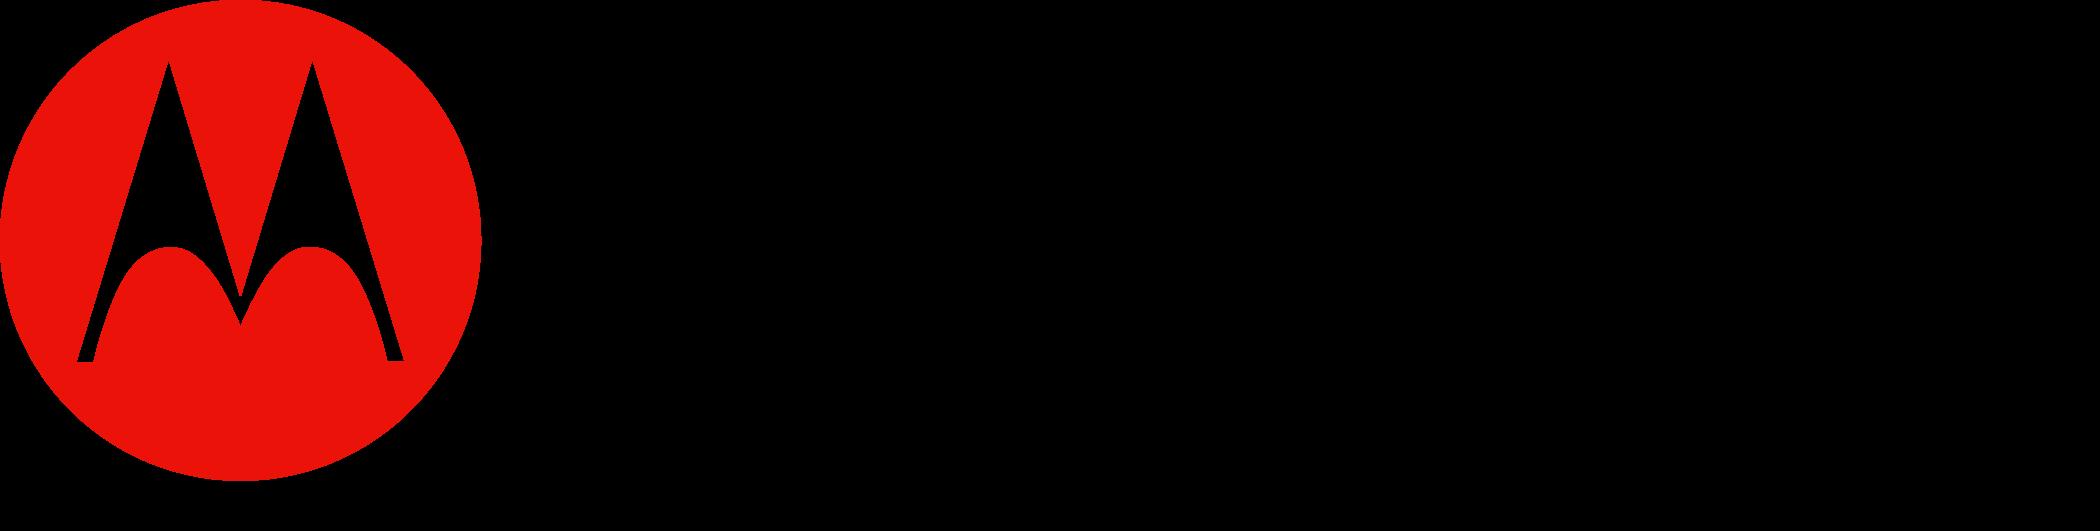 download motorola logo lenovo 19 de novembro de capital title logo full size png image pngkit de novembro de capital title logo